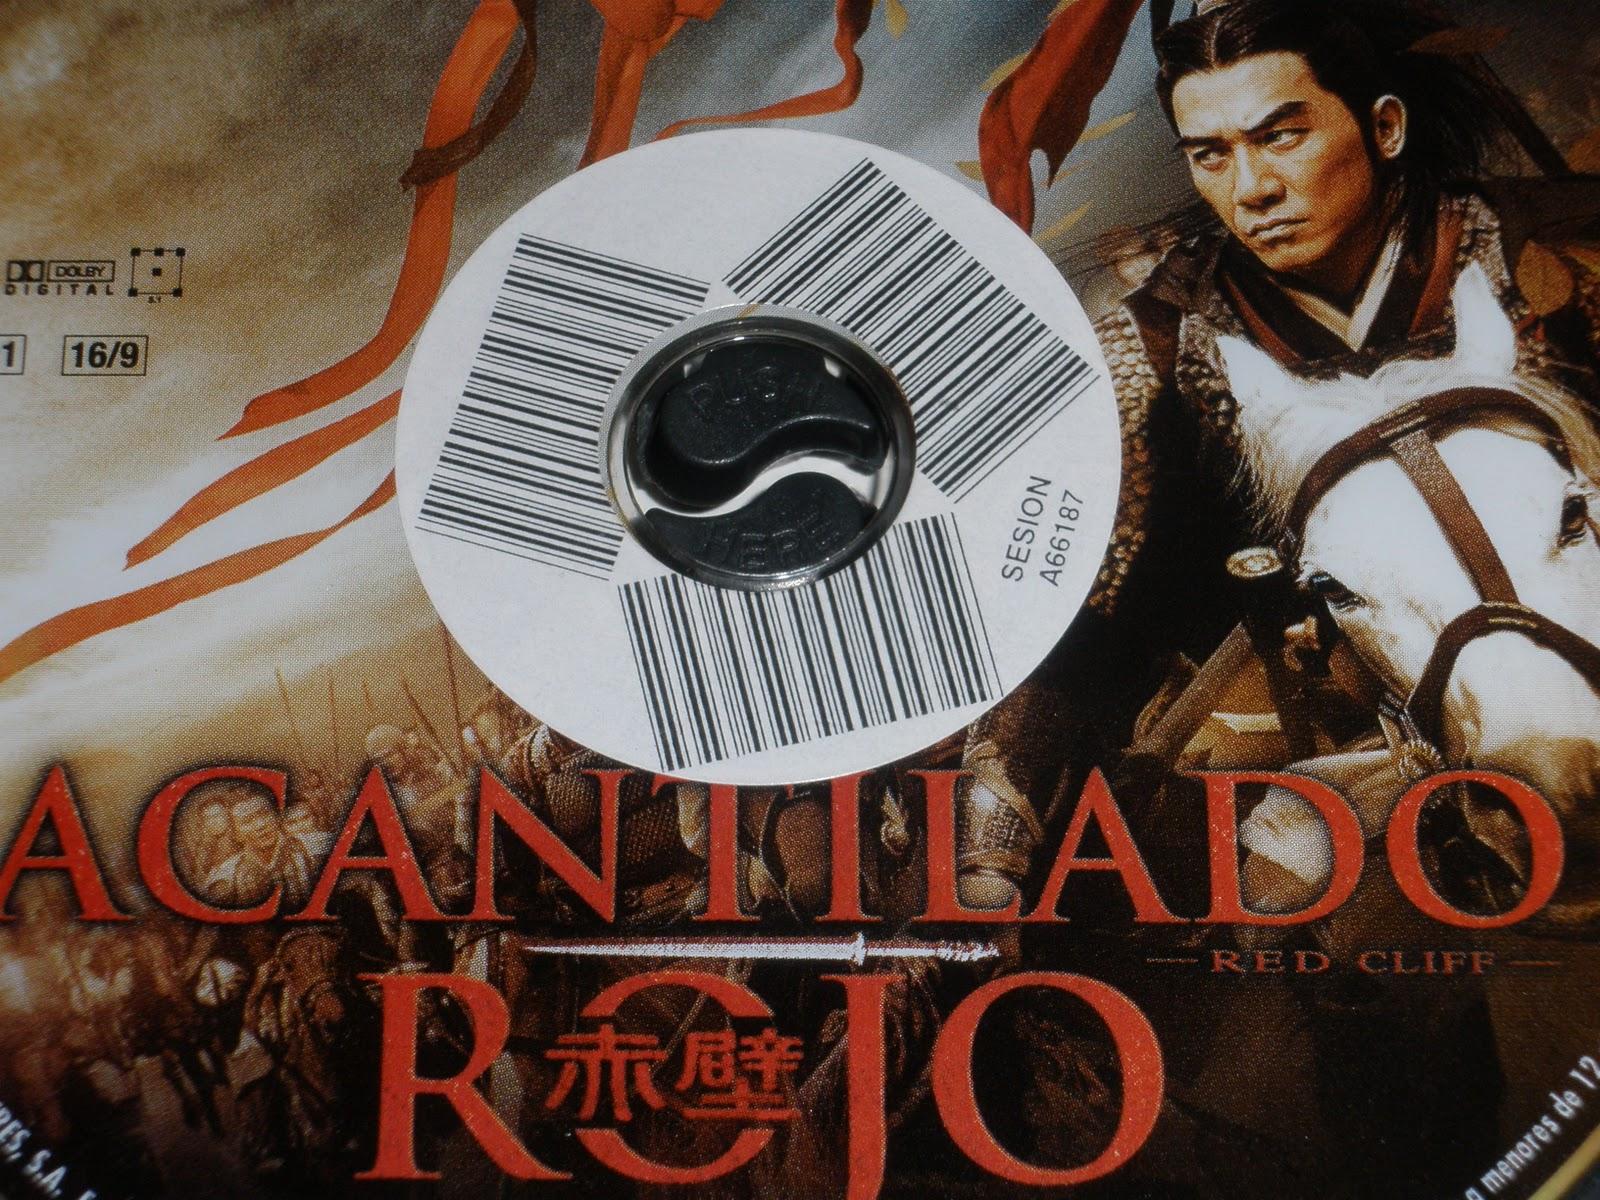 fe958cf13ca Acantilado rojo o el arte de la guerra